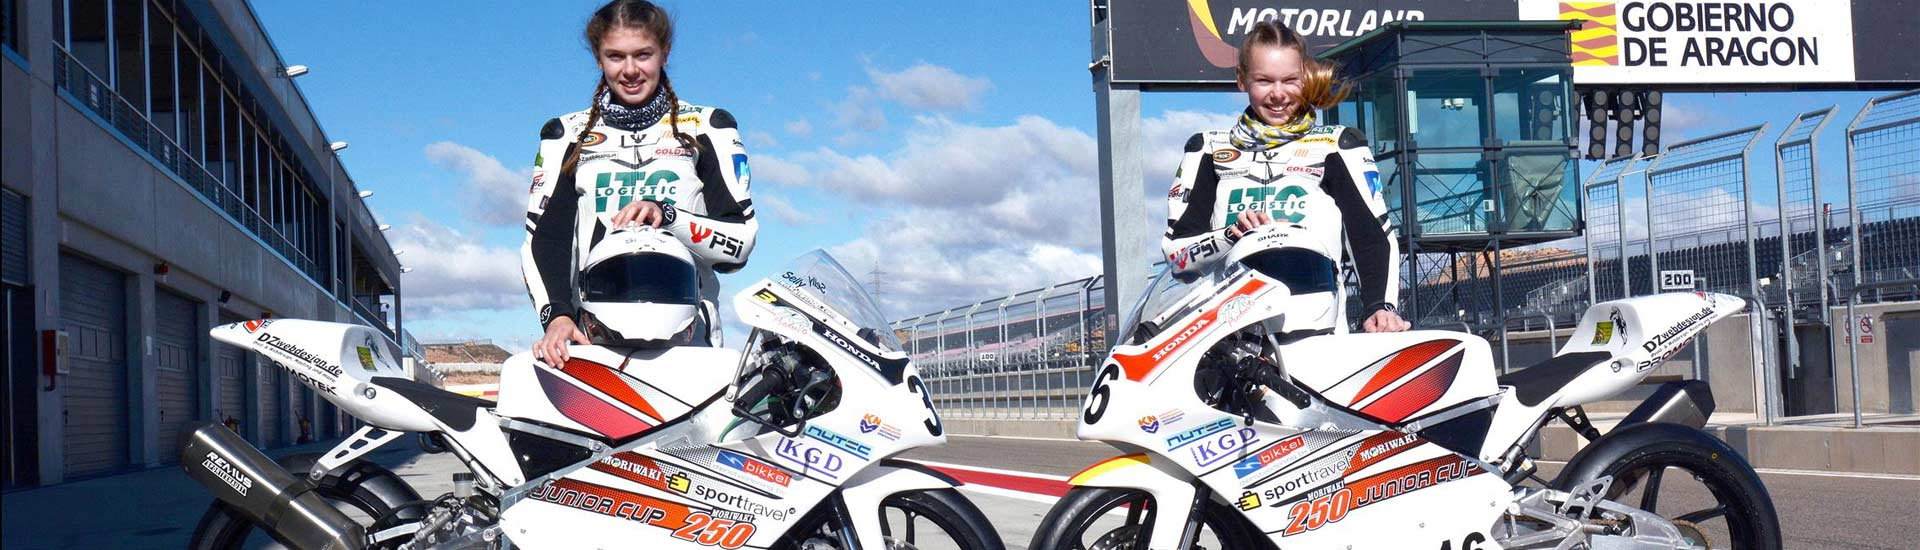 WT-Racing Team Slider Moriwaki